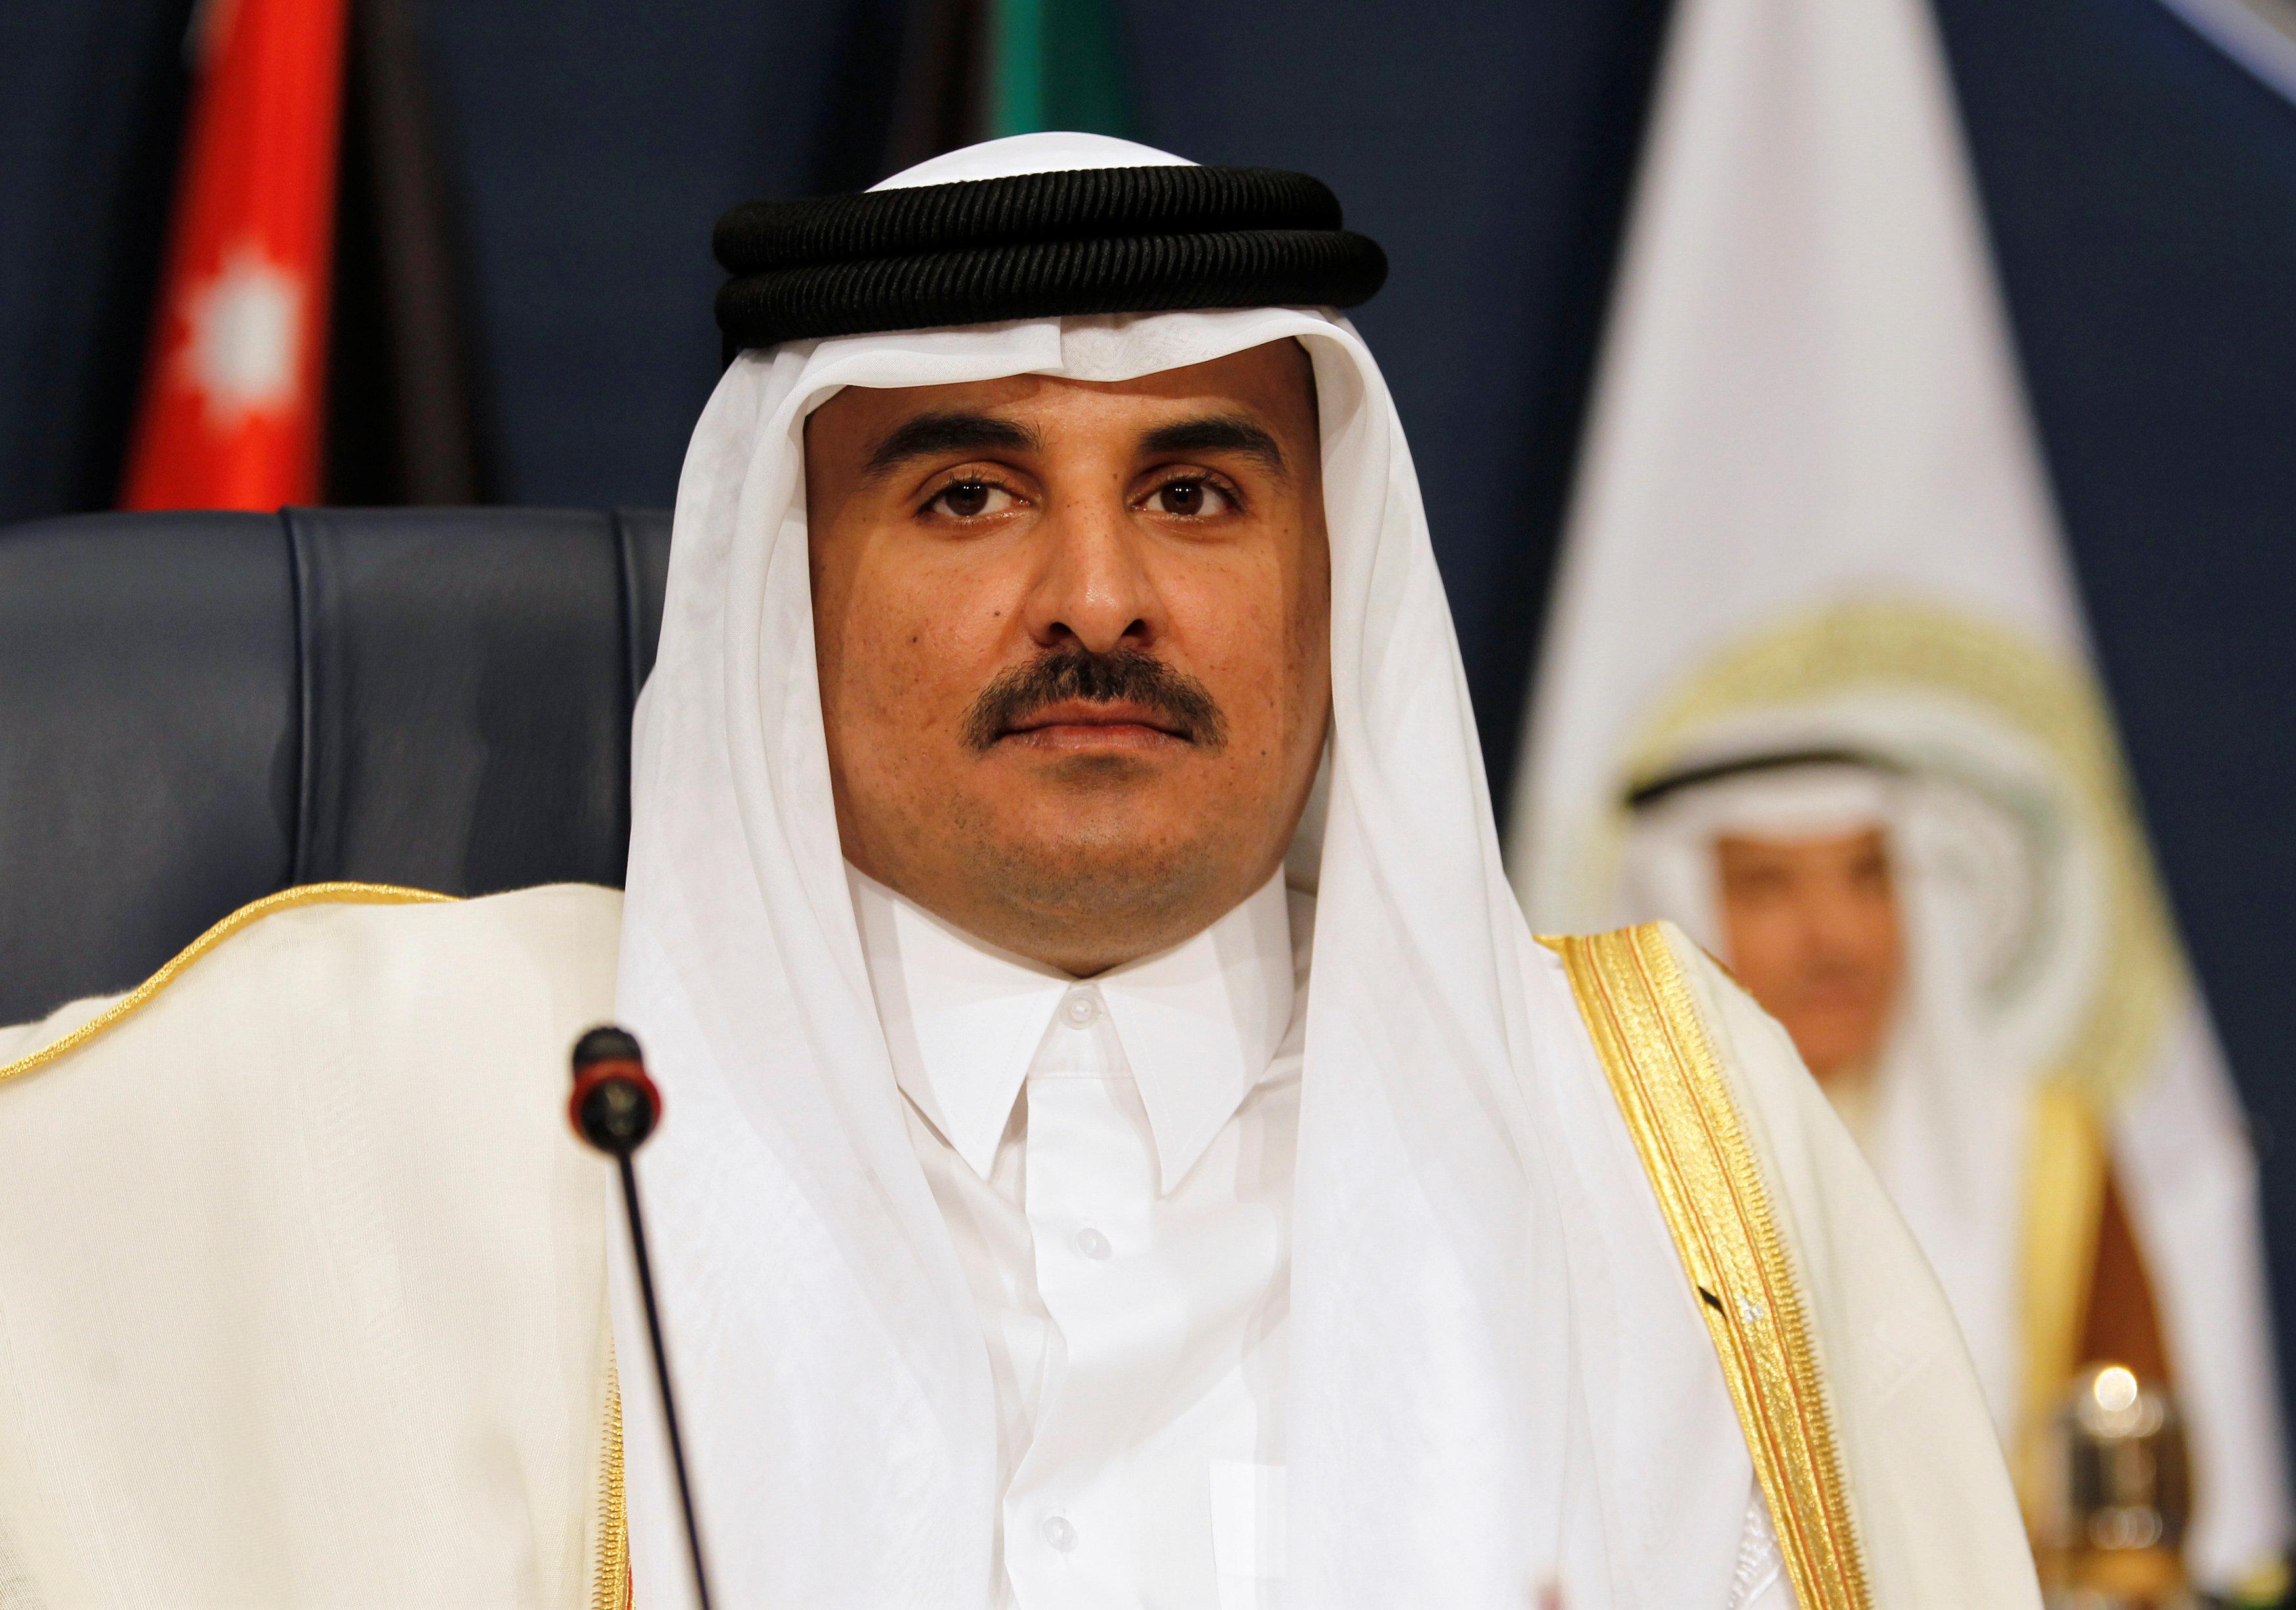 Jeque Tamim bin Hamad al-Thani